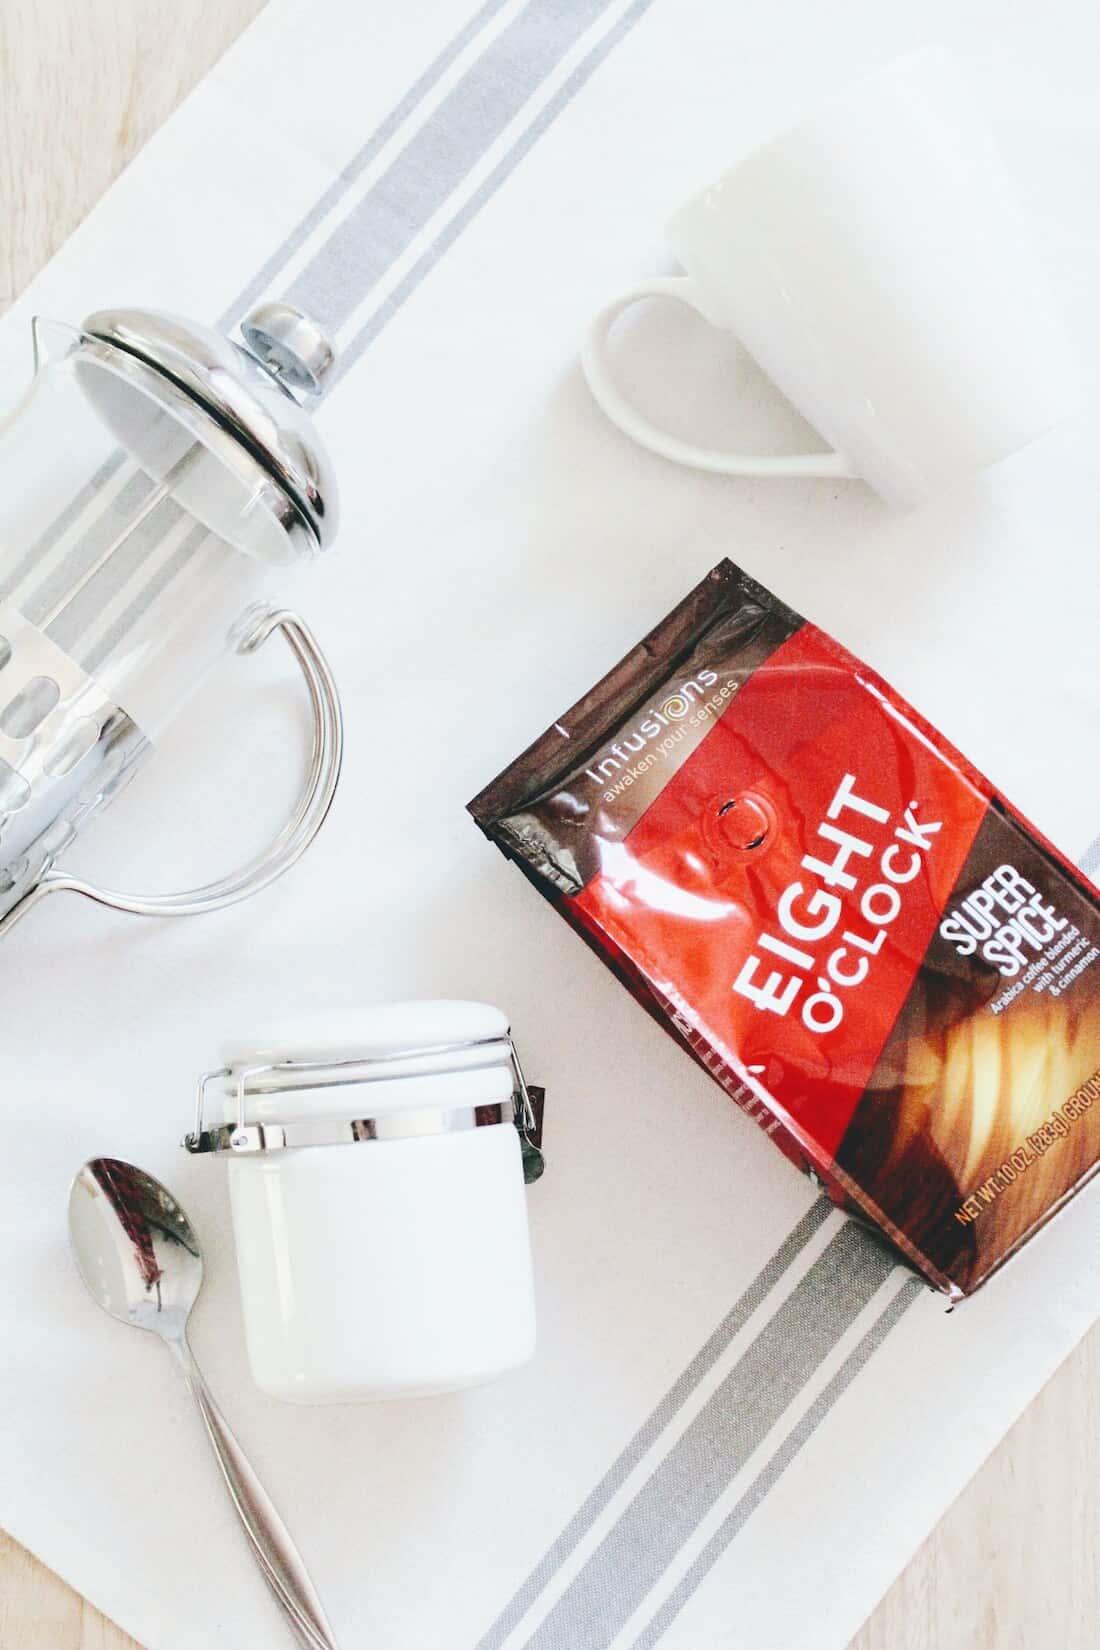 Eight O\'Clock Coffee product next to mug and coffee items.